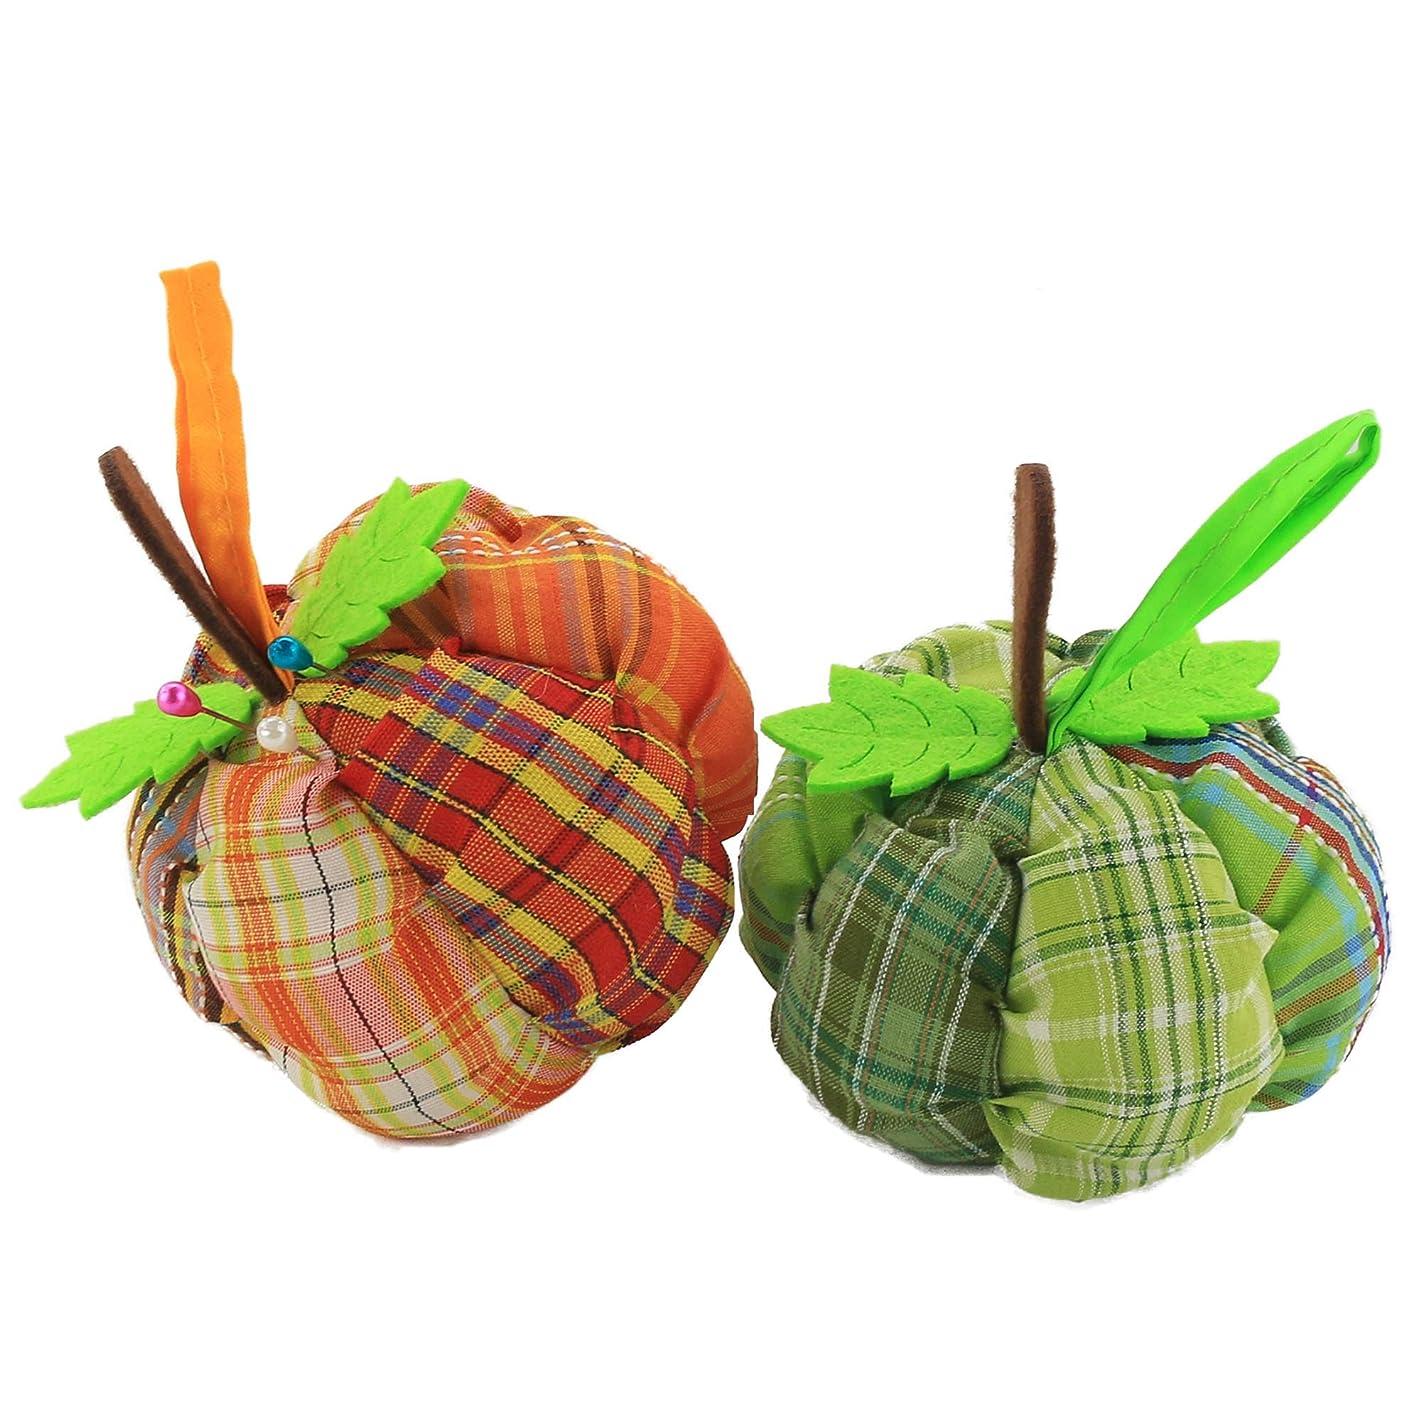 Wewill Handcraft Novetly Pumpkin Pincushion, Needle Holder Sewing Kit, DIY Craft, Pack ot 2 (Pumpkin)